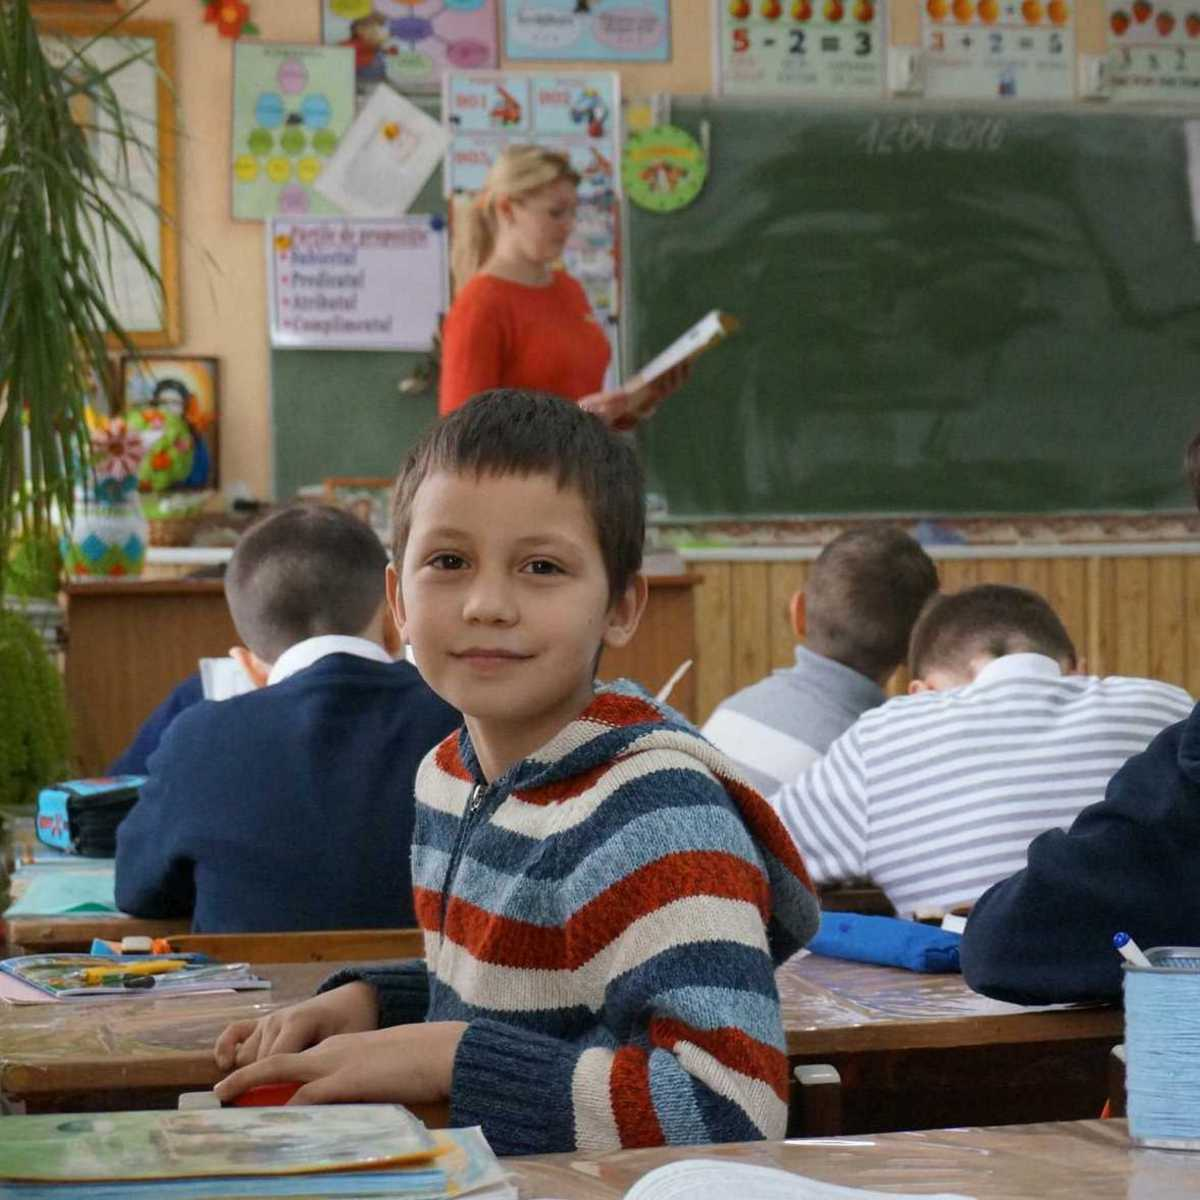 Schüler während des Unterrichts im Gimnaziul